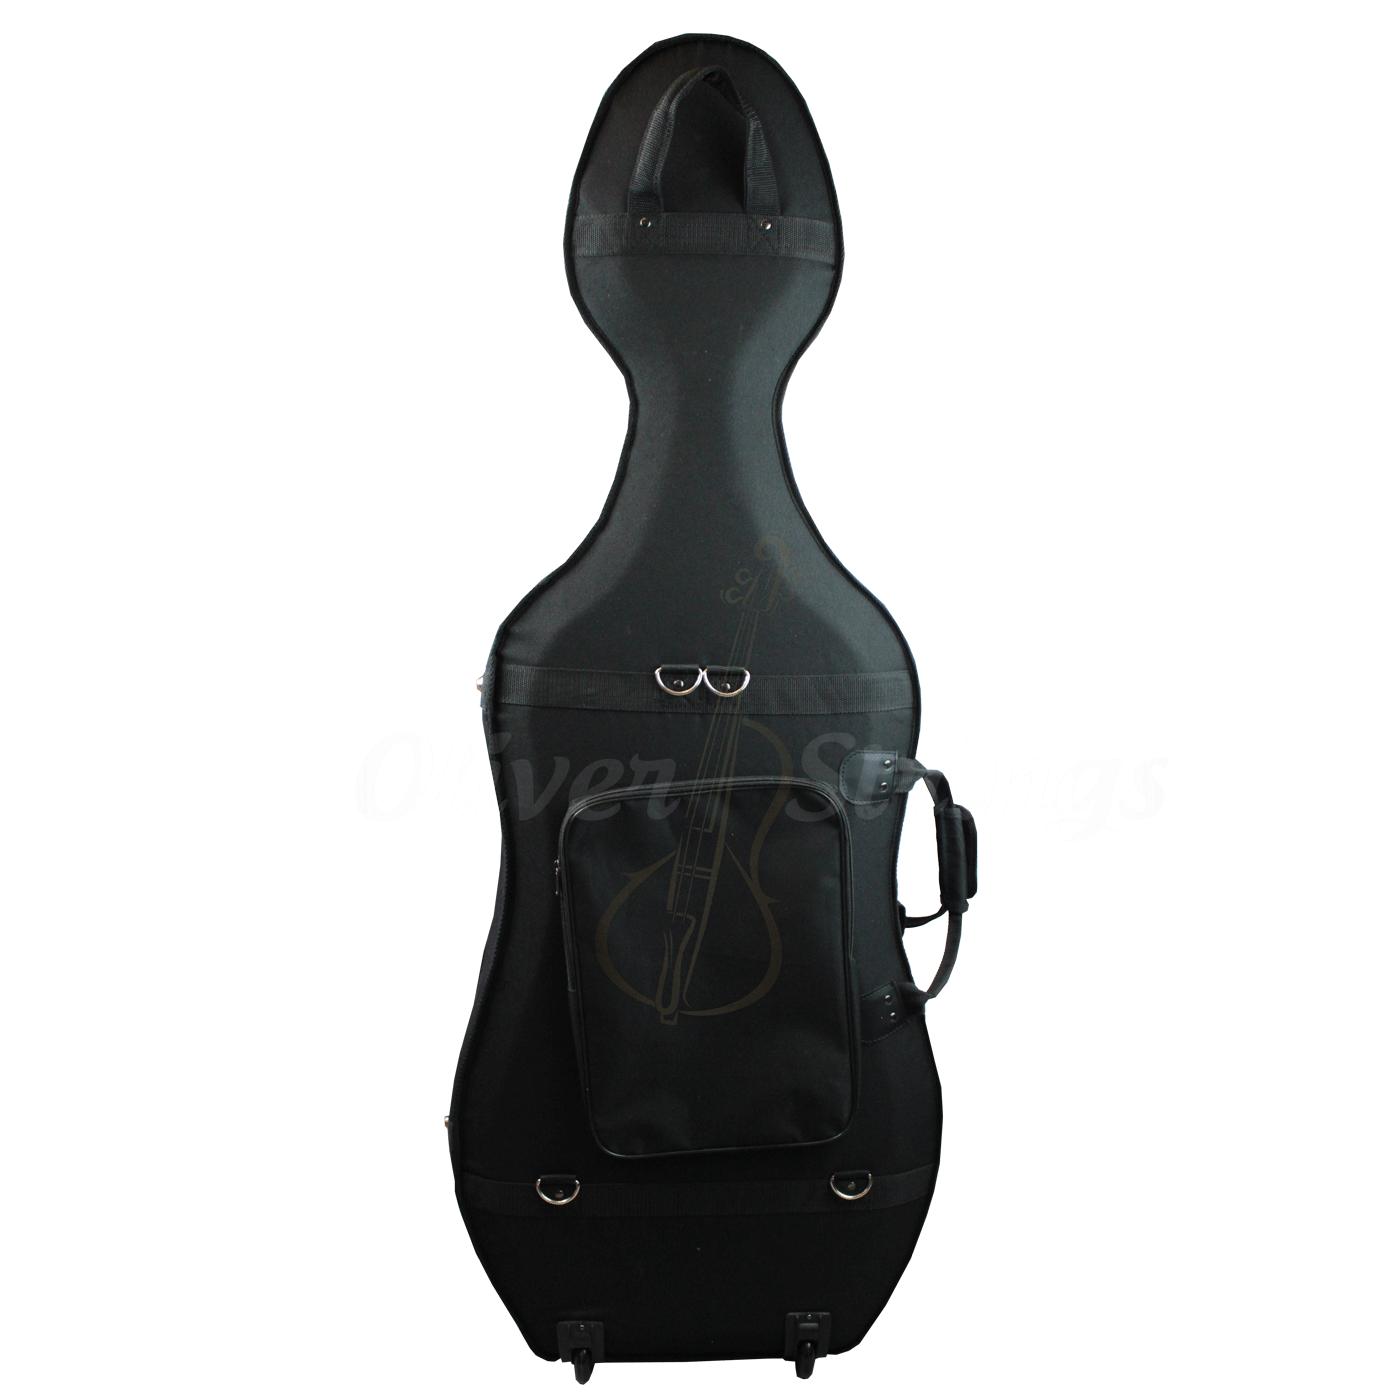 Estojo luxo para violoncelo na cor preta